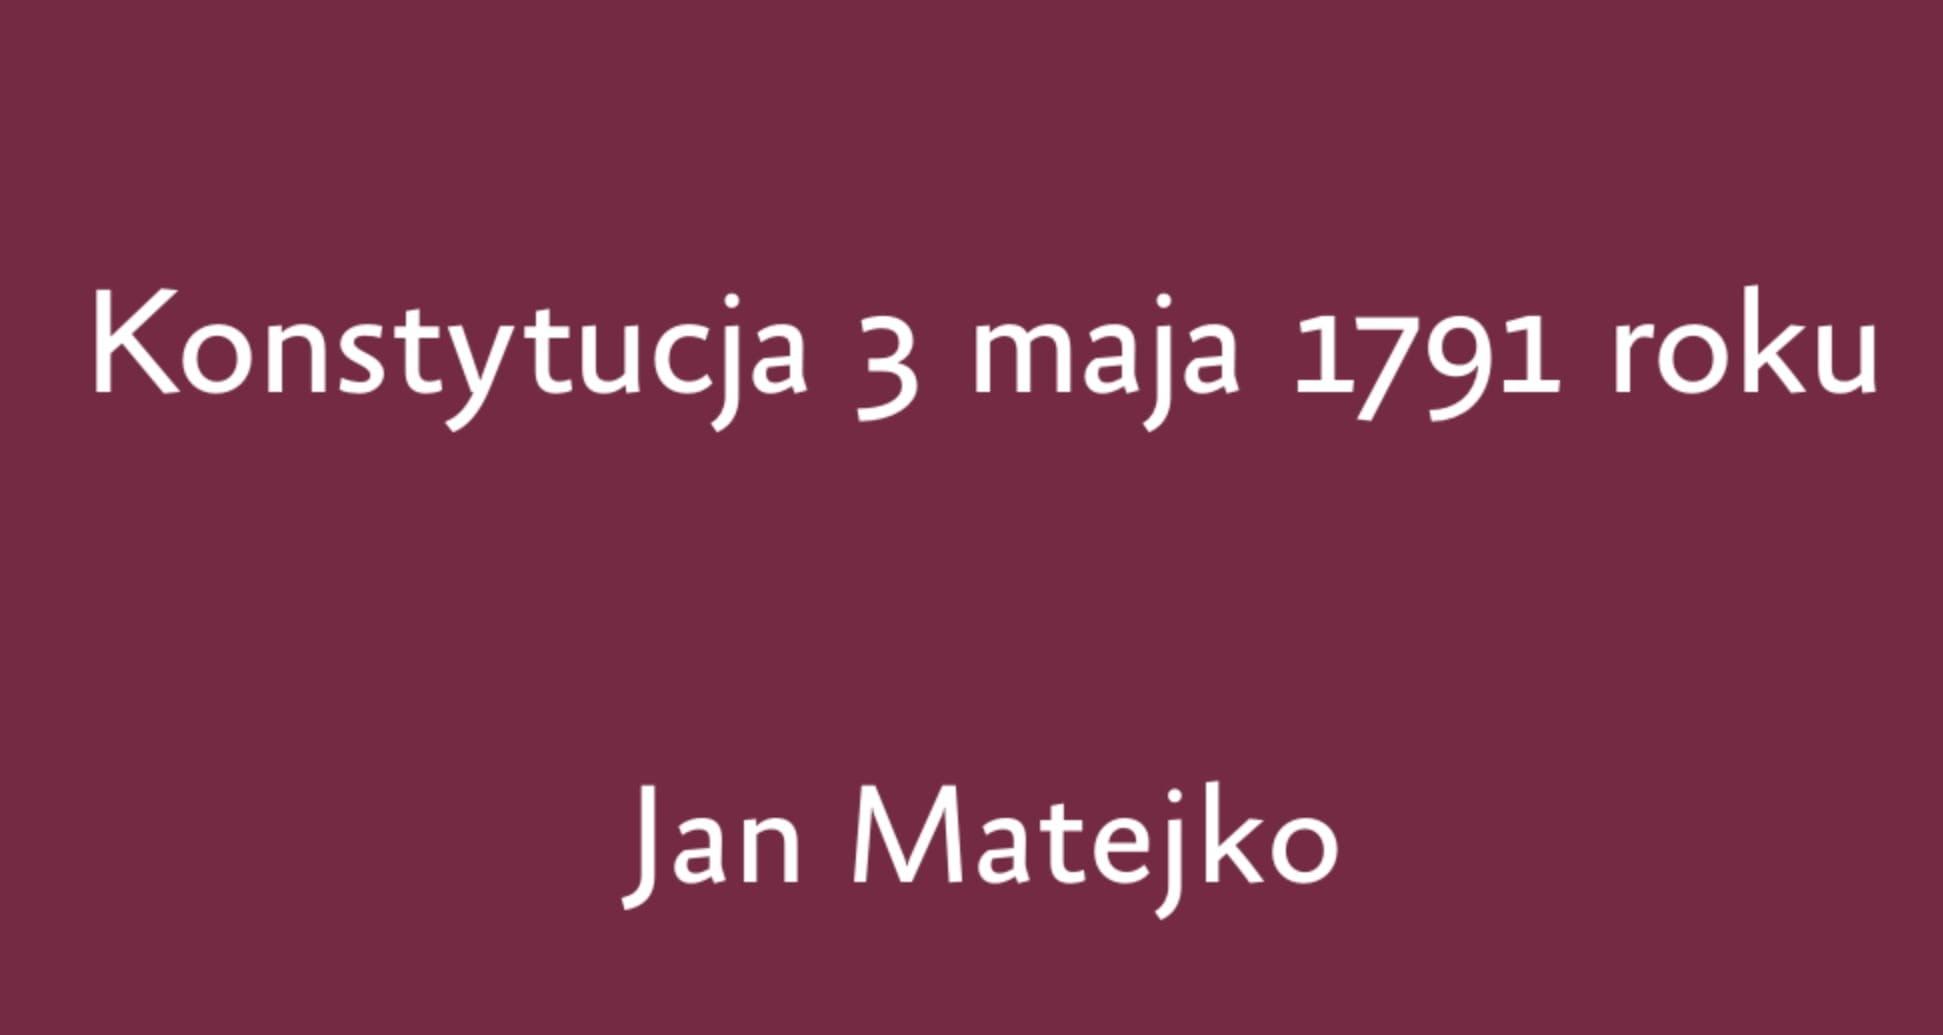 Konstytucja 3 Maja 1791 roku, Jan Matejko, obraz z objaśnieniami